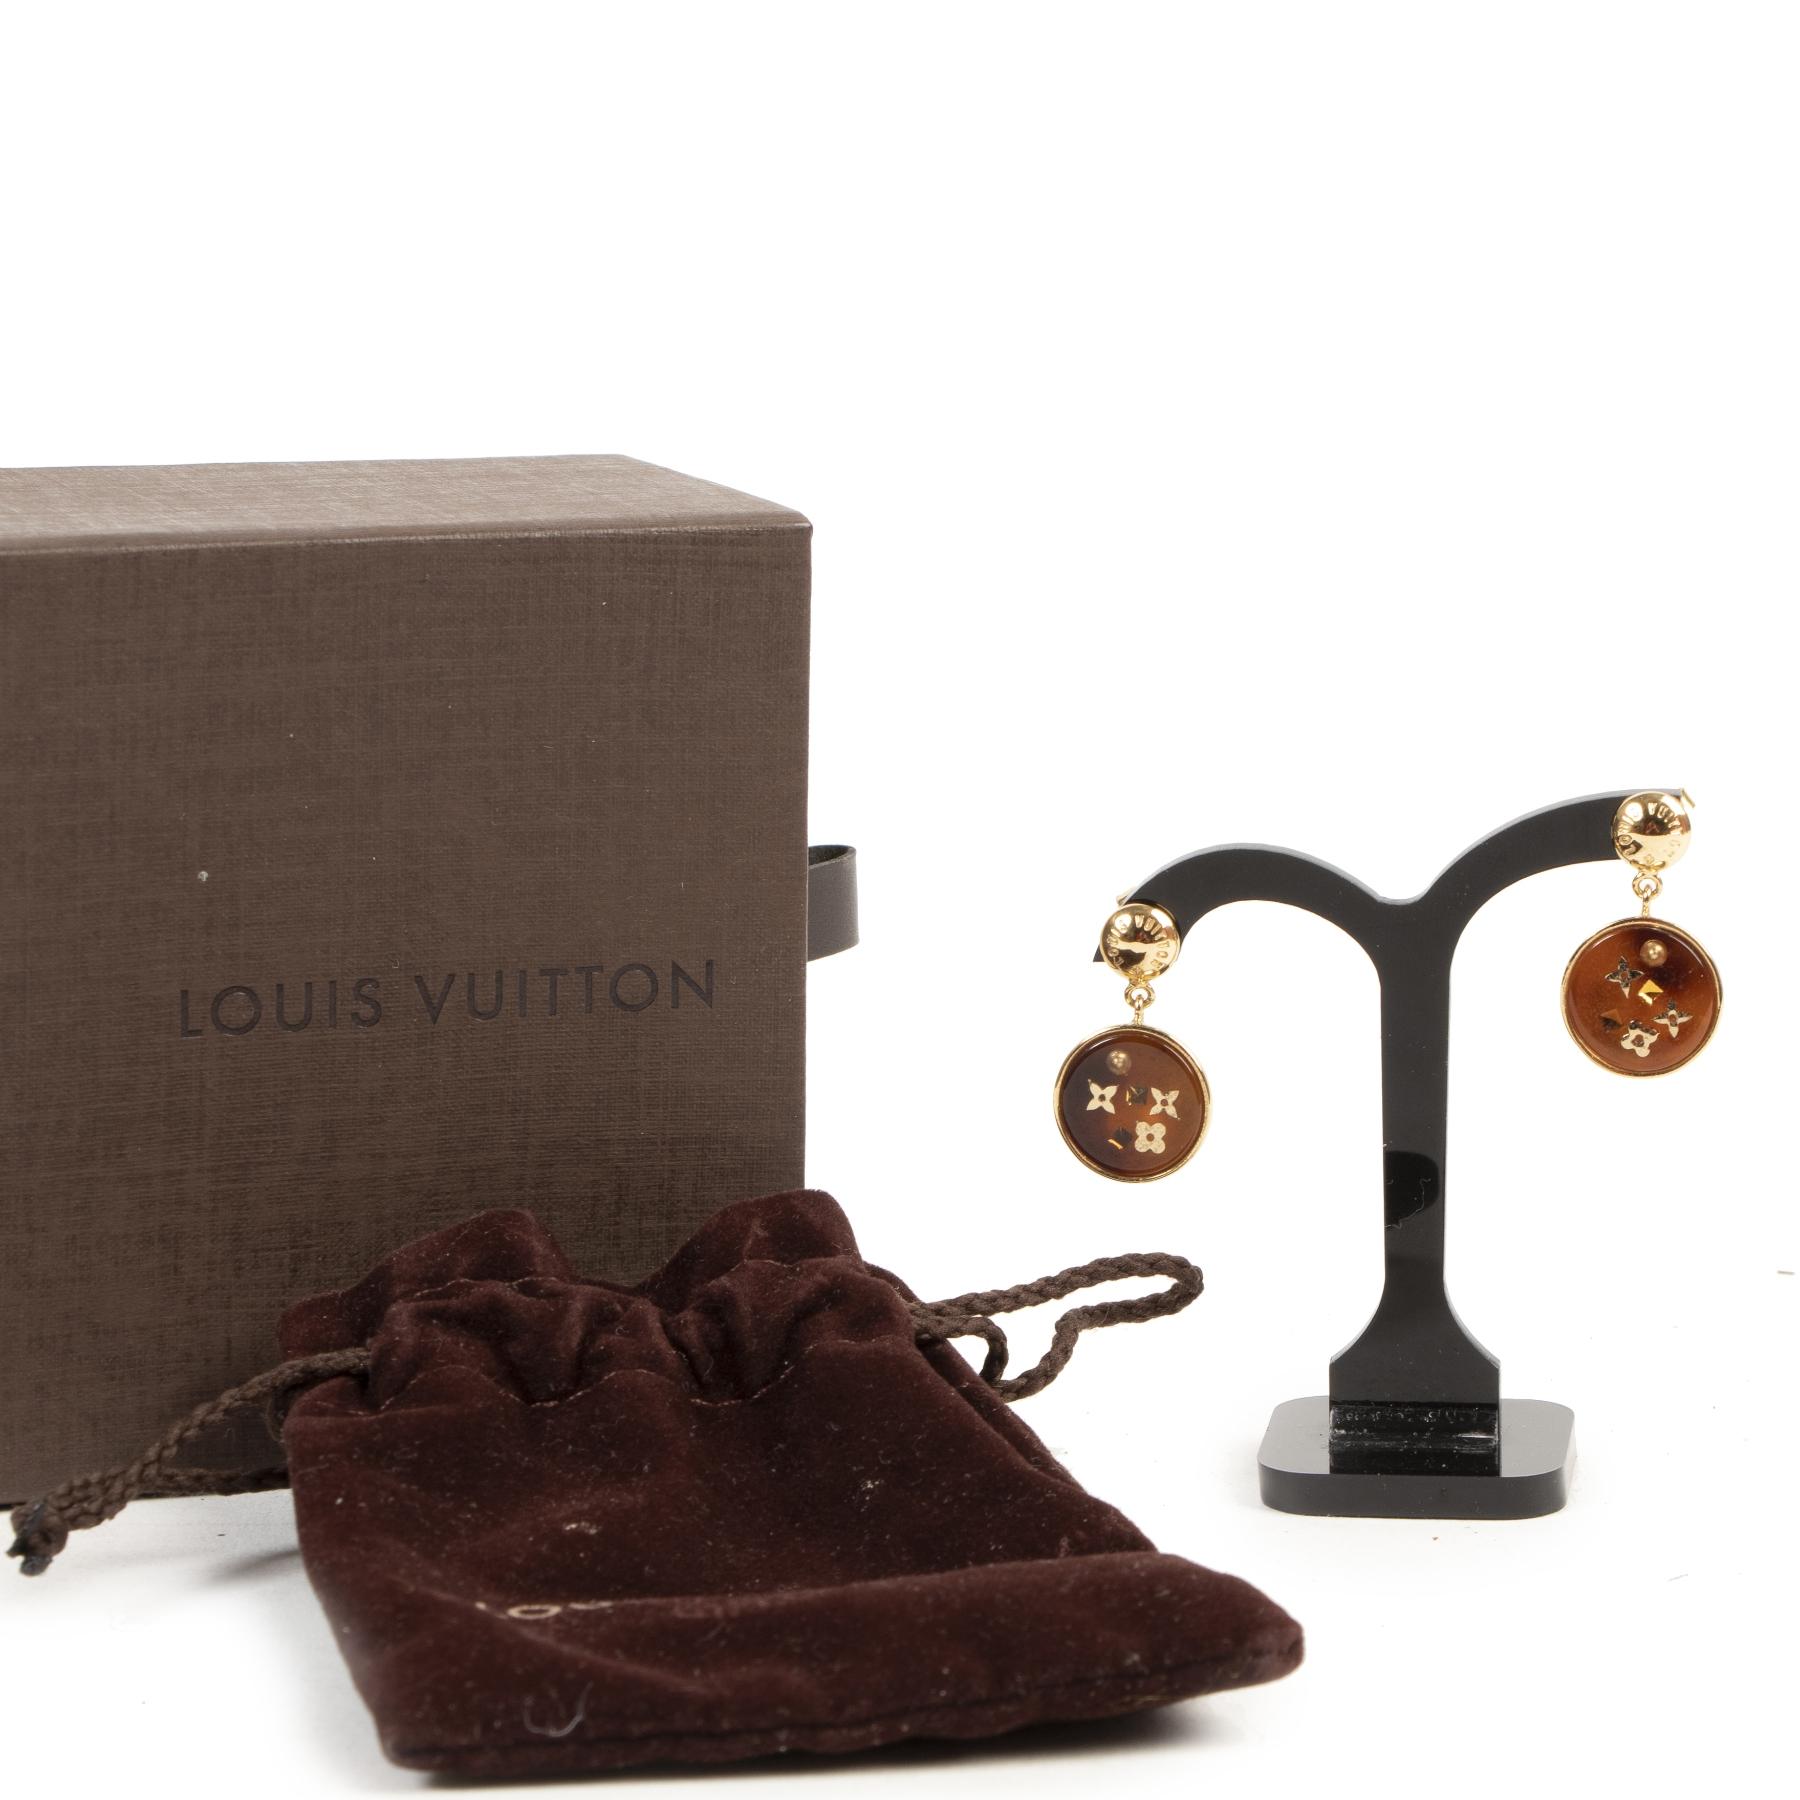 shop safe online Louis Vuitton Monogram Detailed Resin Earrings